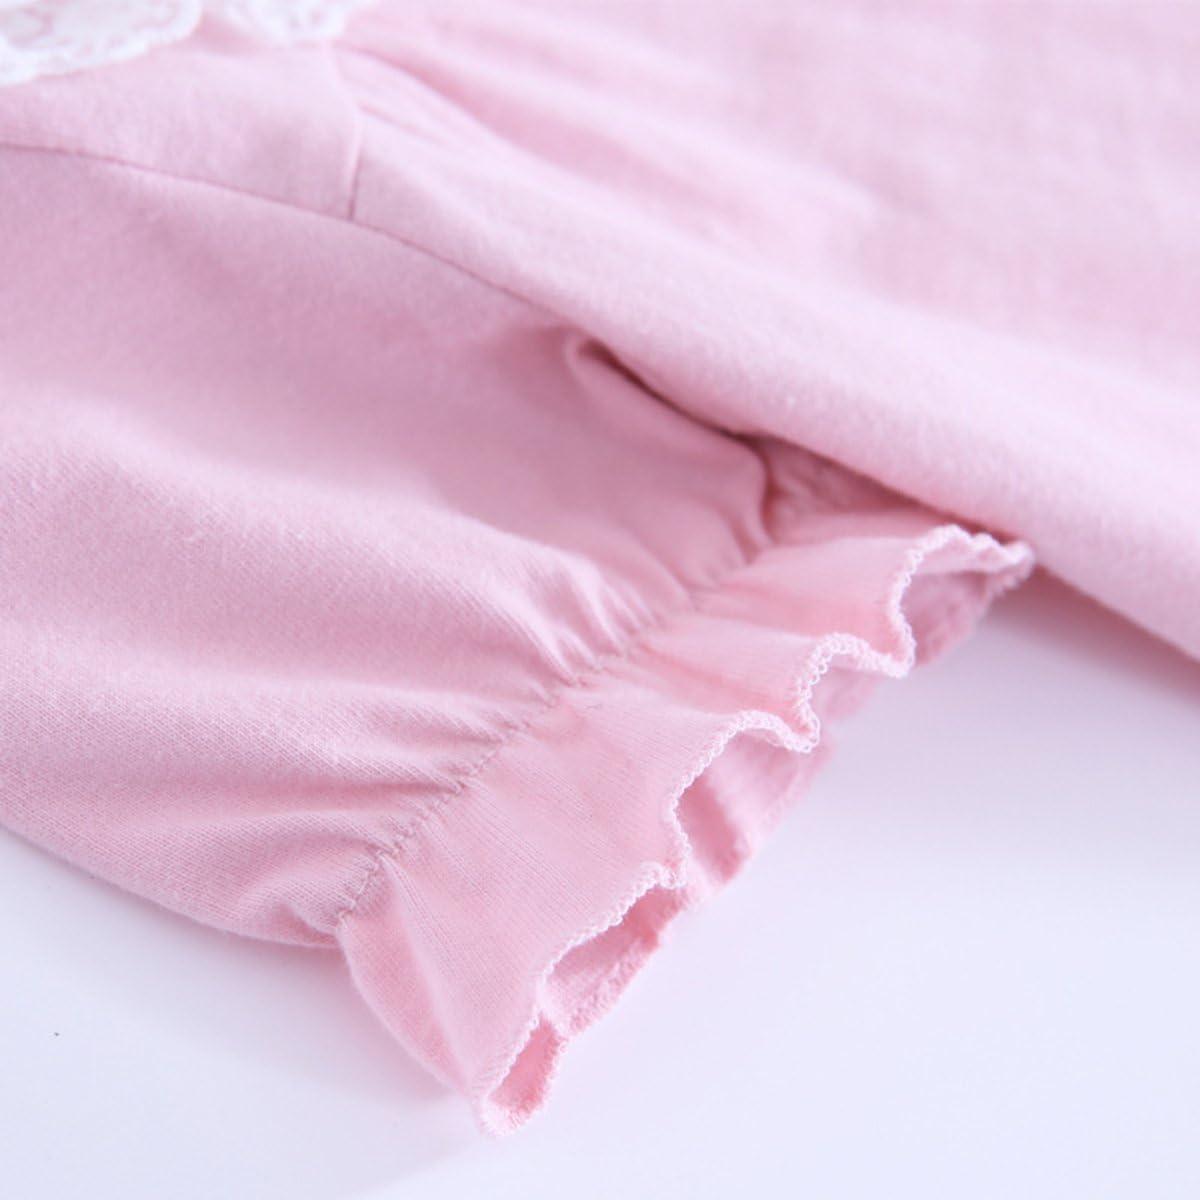 KINYBABY Little Girls Cute Cotton Nightgown Lace Bowknot Nightdress Sleepwear Pajamas